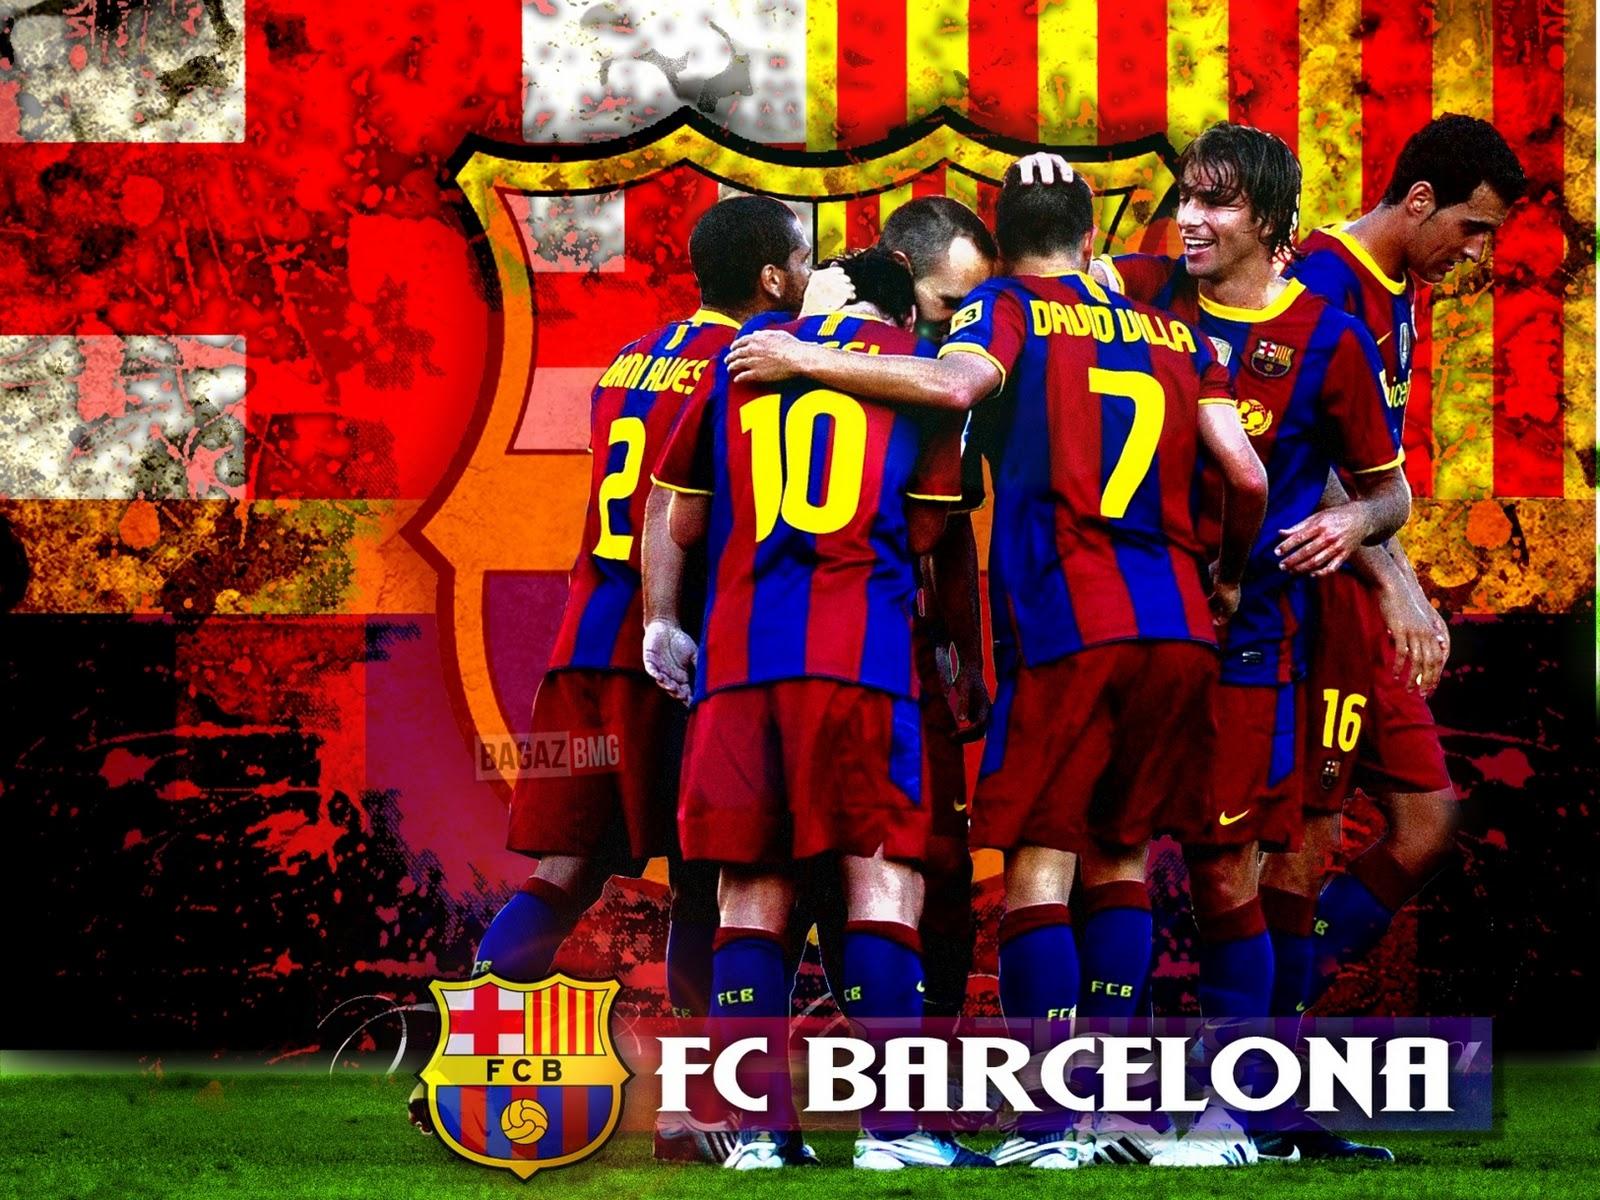 Barcelona+FC+New+HD+Wallpaper+ ...